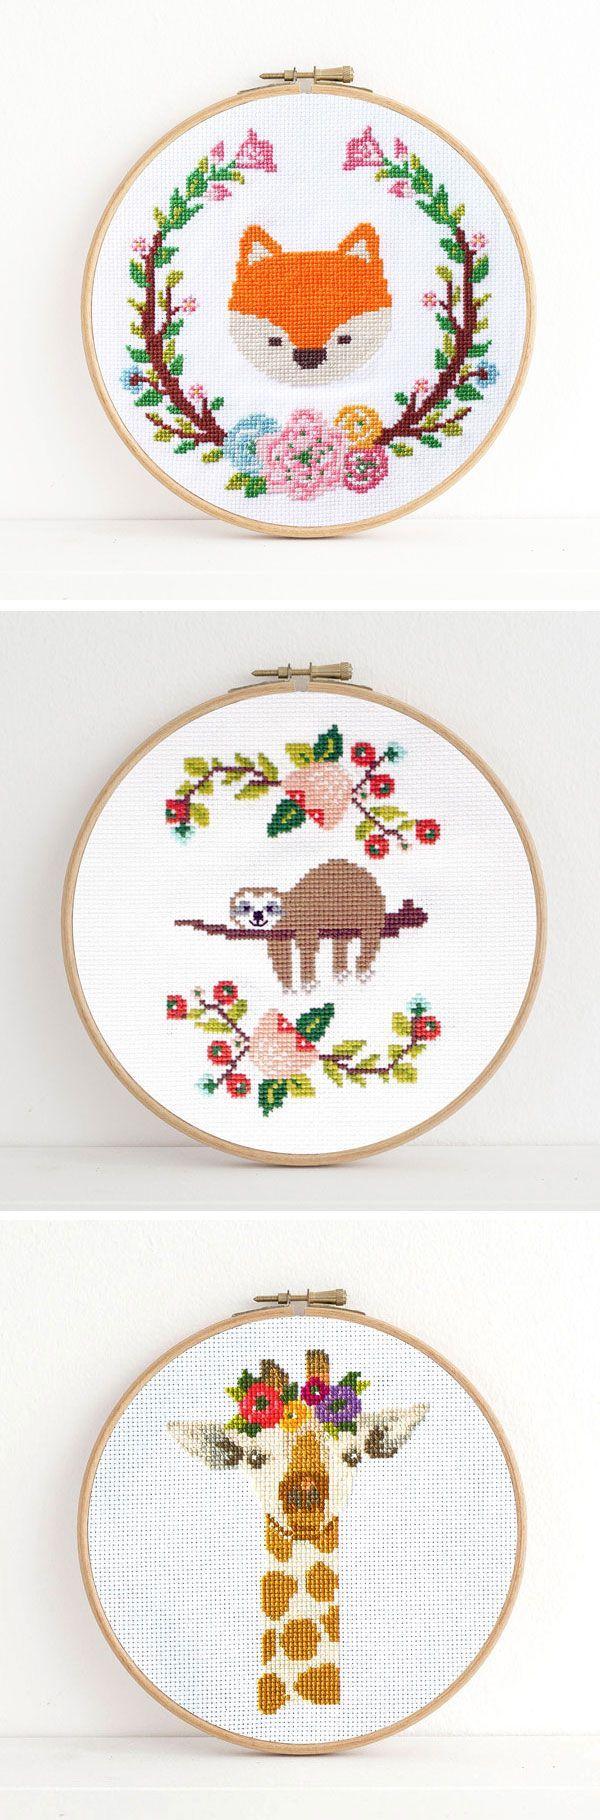 Adorable animal cross stitch patterns by Dear Sukie #crossstitch #moderncrossstitch #xstitch